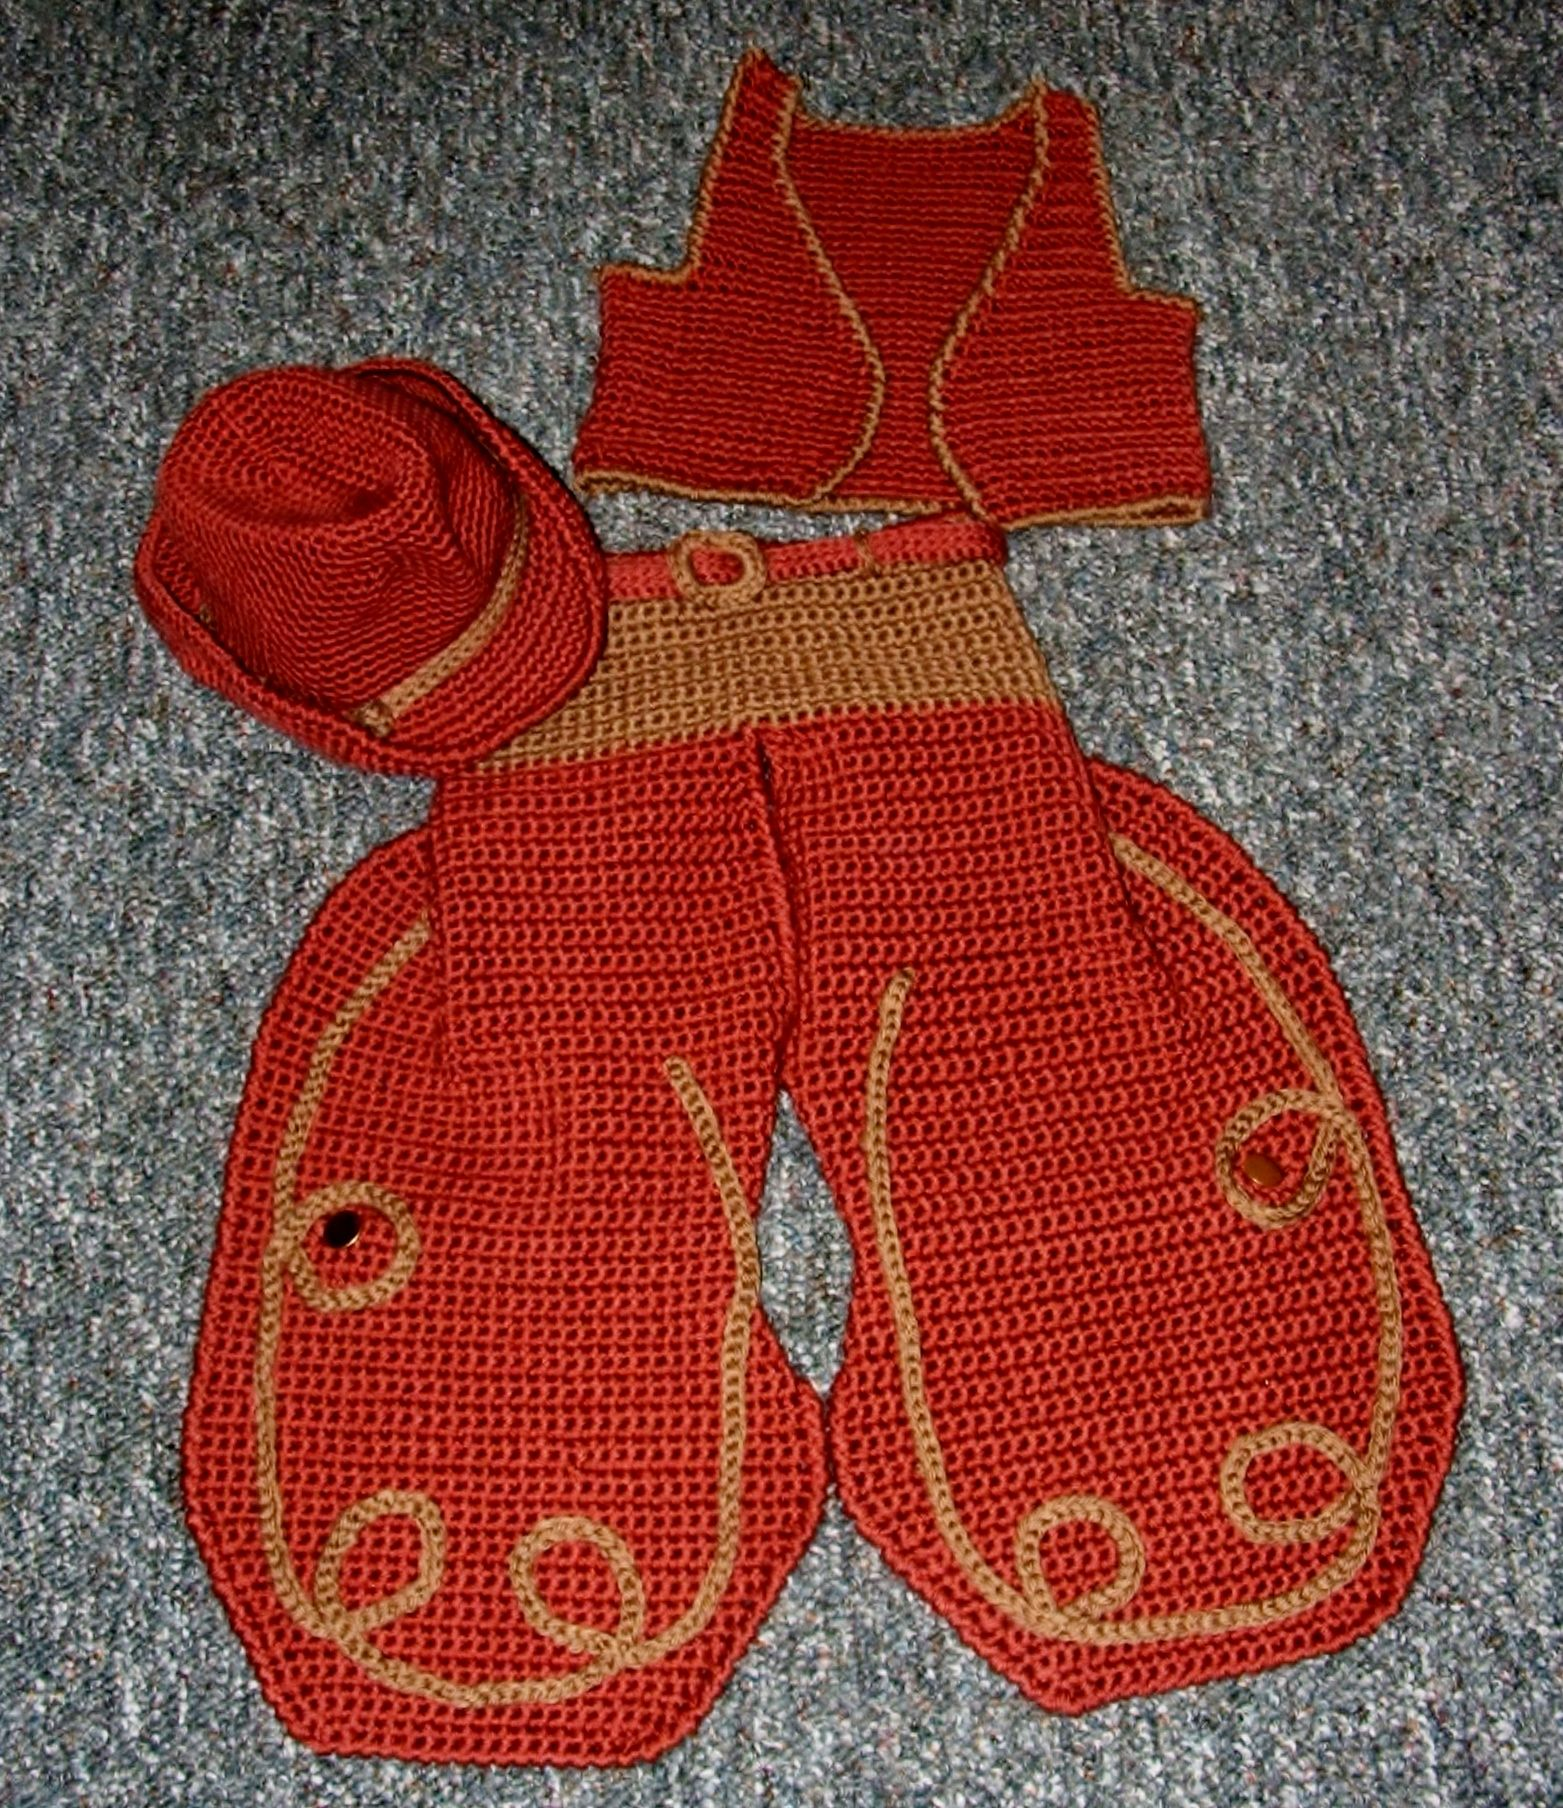 Big buckaroo crochet pattern baby vest vest pattern and crochet big buckaroo crochet pattern plaid shirtsbaby itemscrocheting patternscrochet childrencrochet boysfree bankloansurffo Gallery